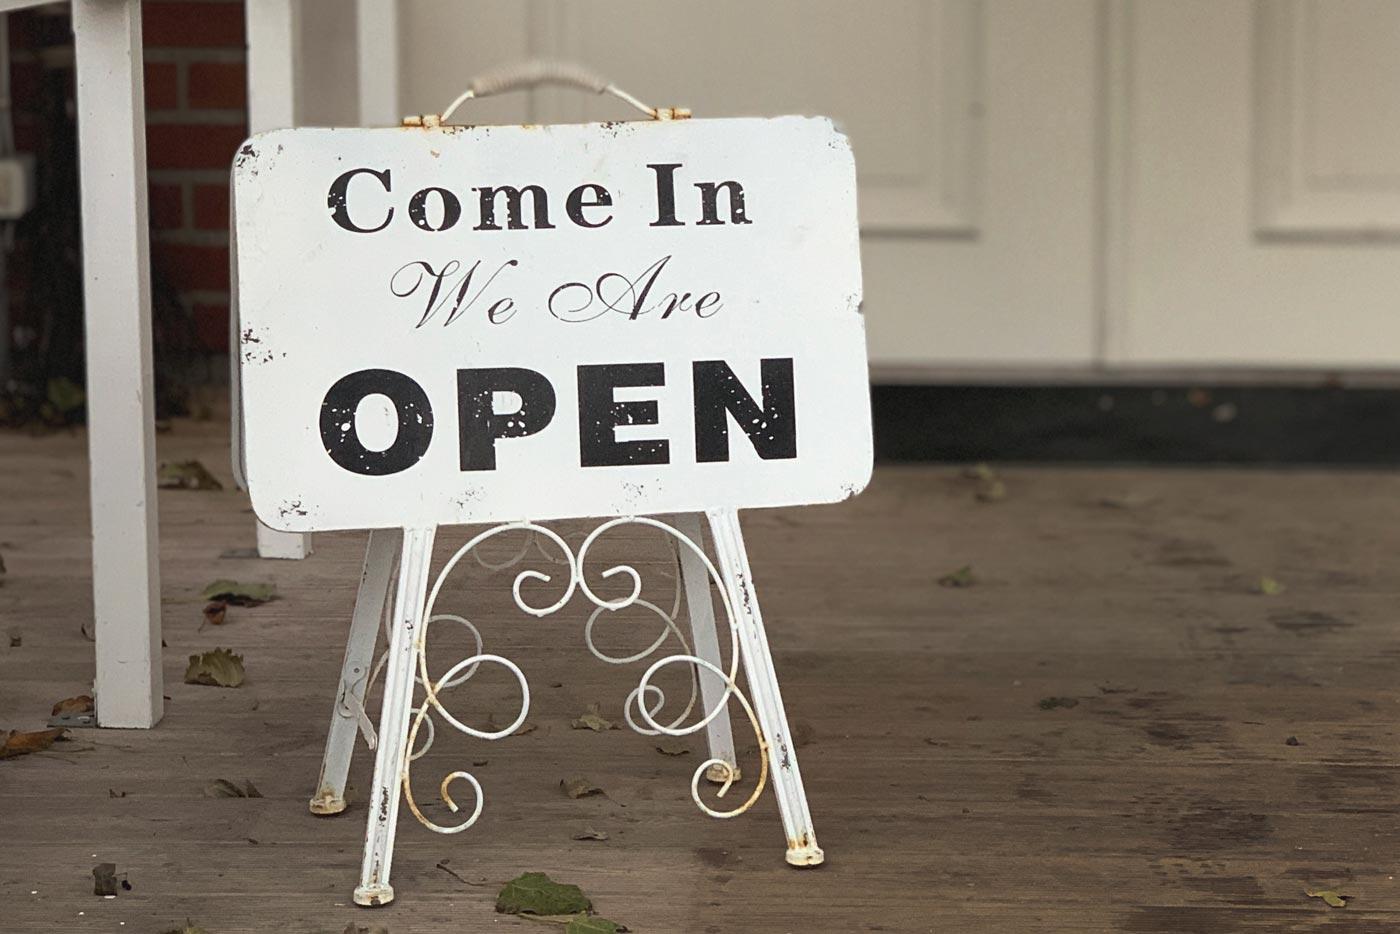 Skylt välkommen in - come in we are open